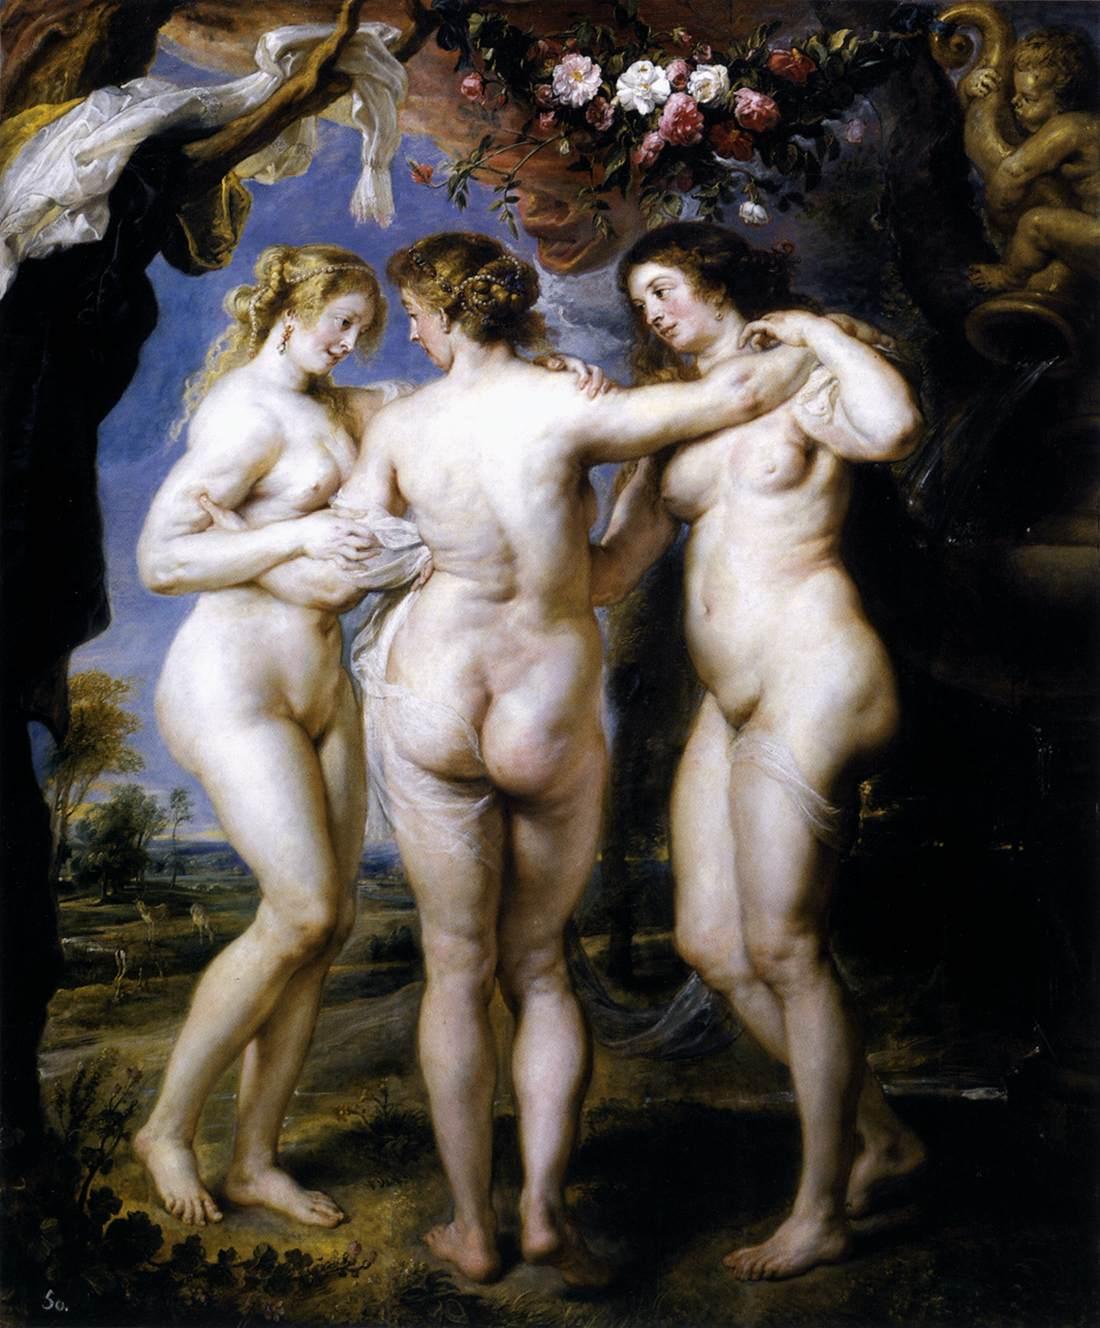 Peter Paul Rubens, De Drie Gratieën, 1639, Museo del Prado, Madrid